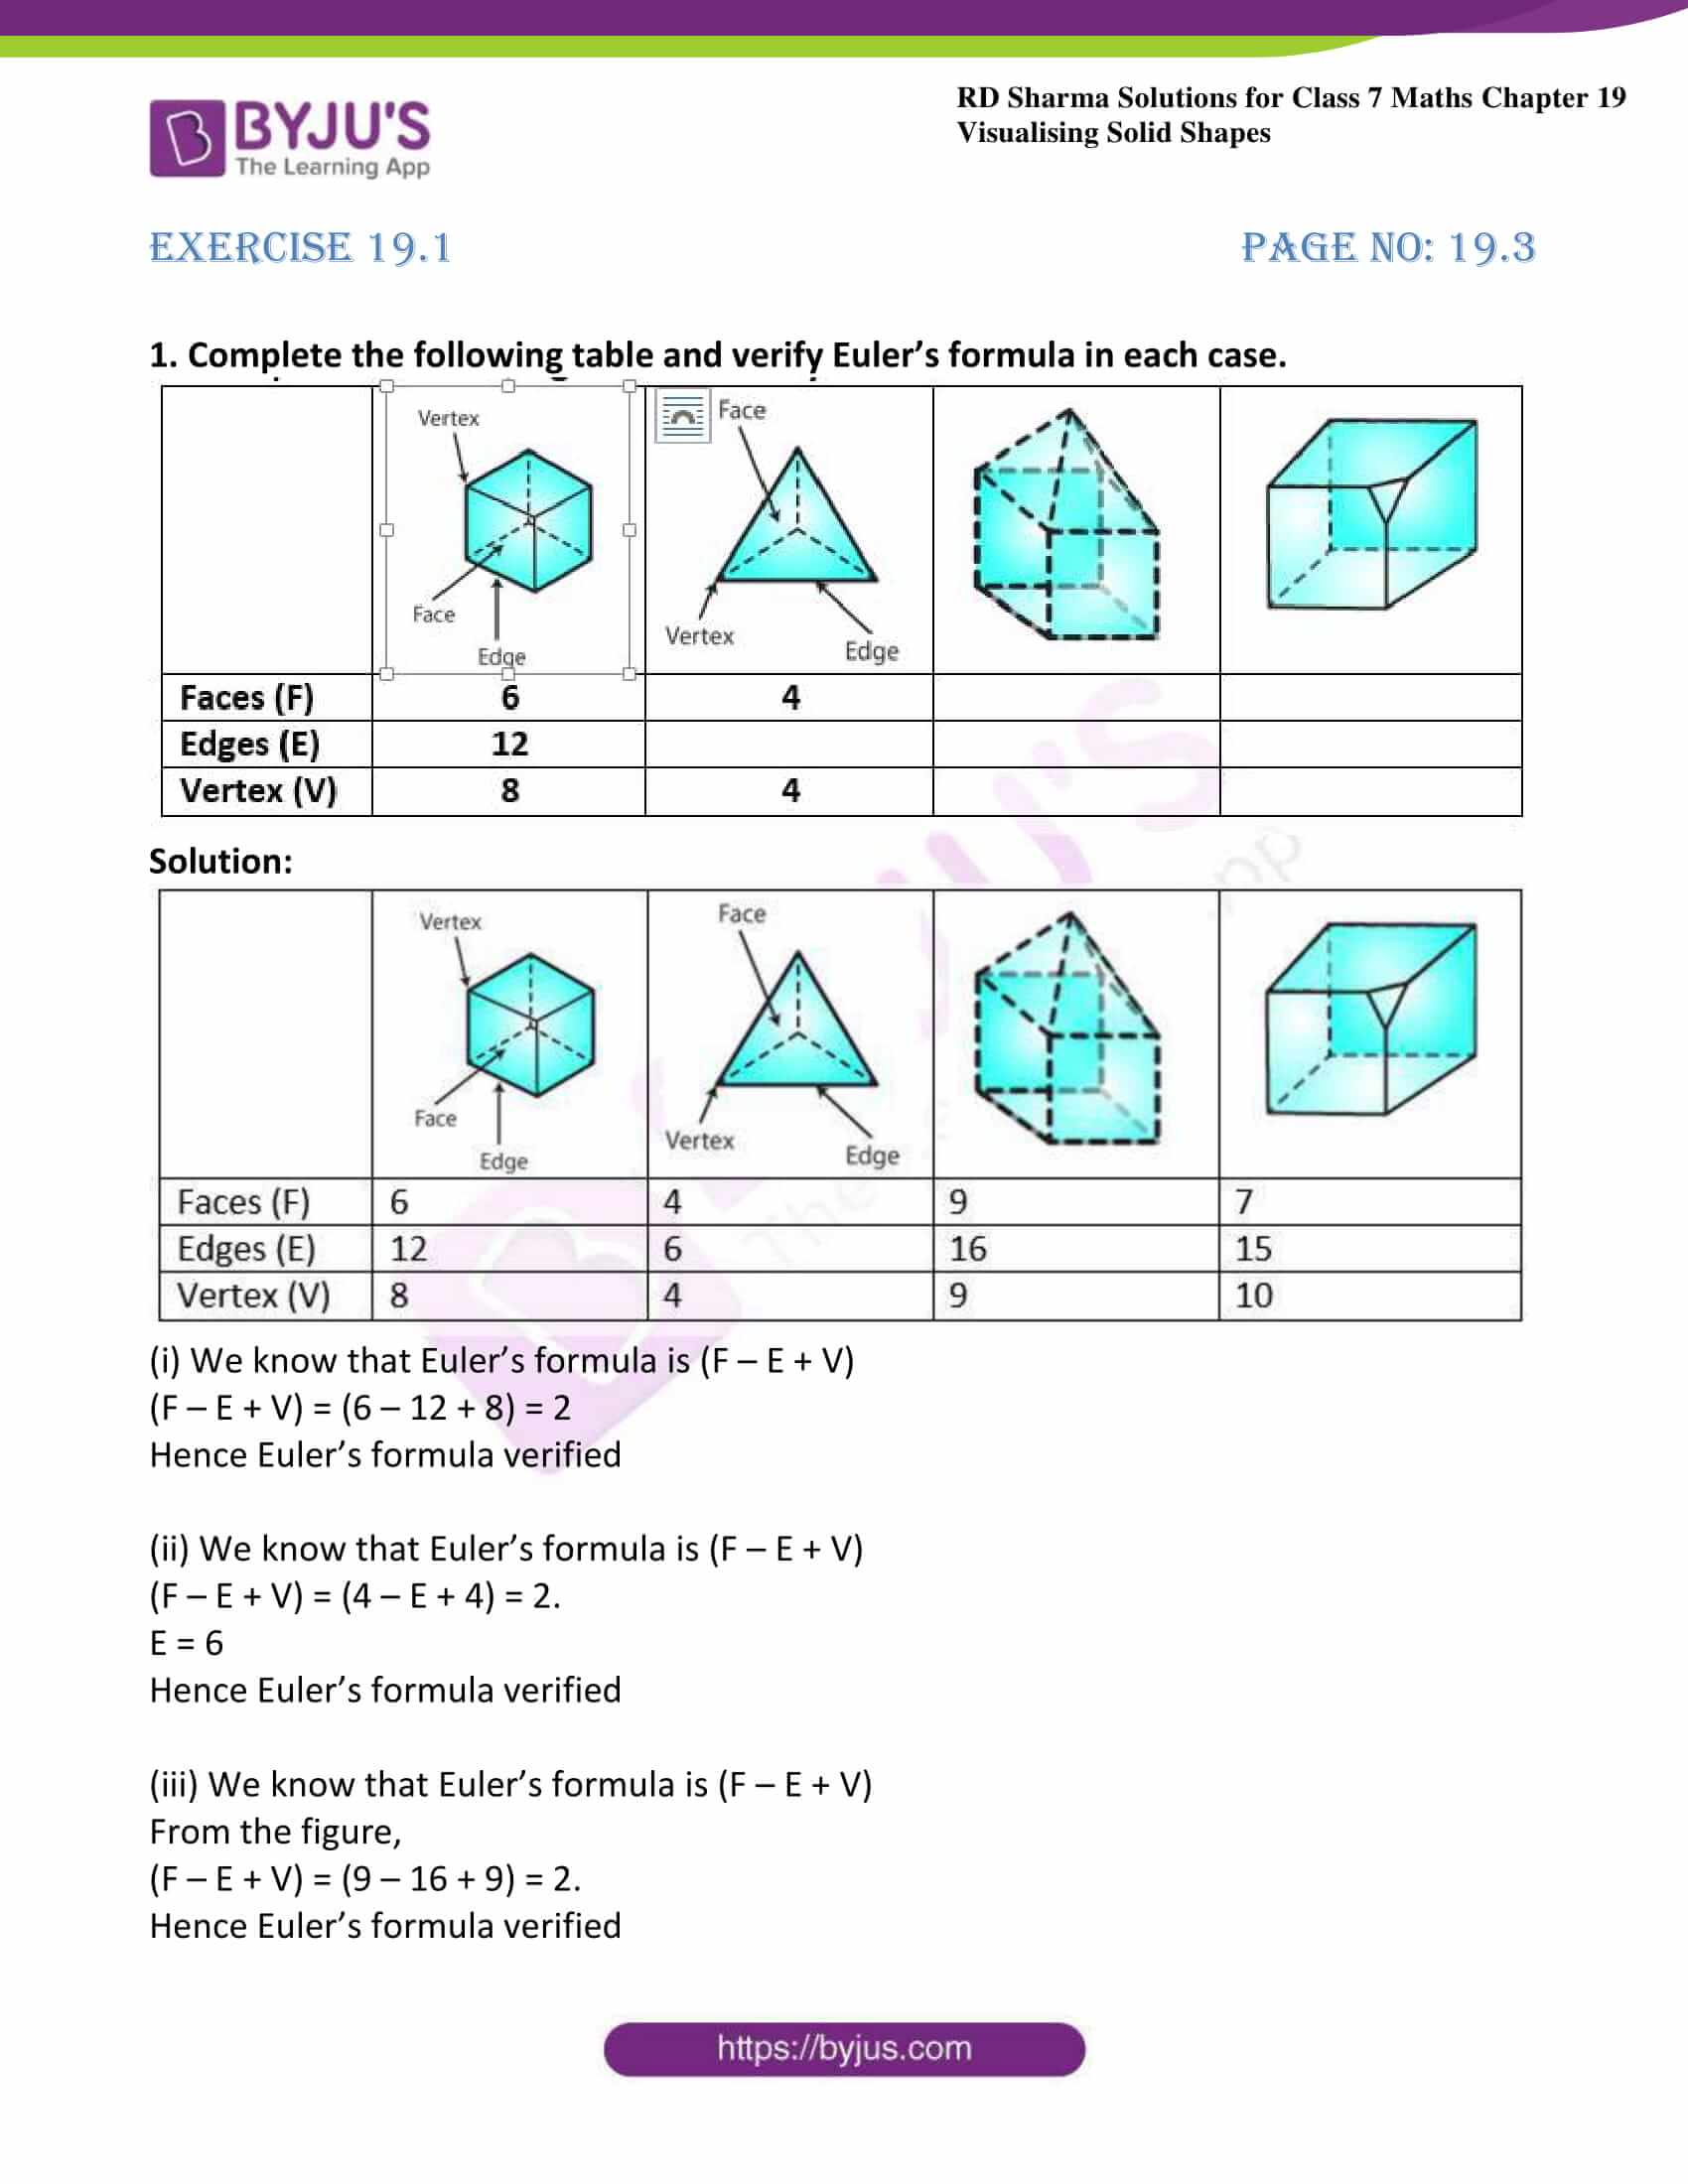 rd sharma class 7 maths solution ch 19 ex 1